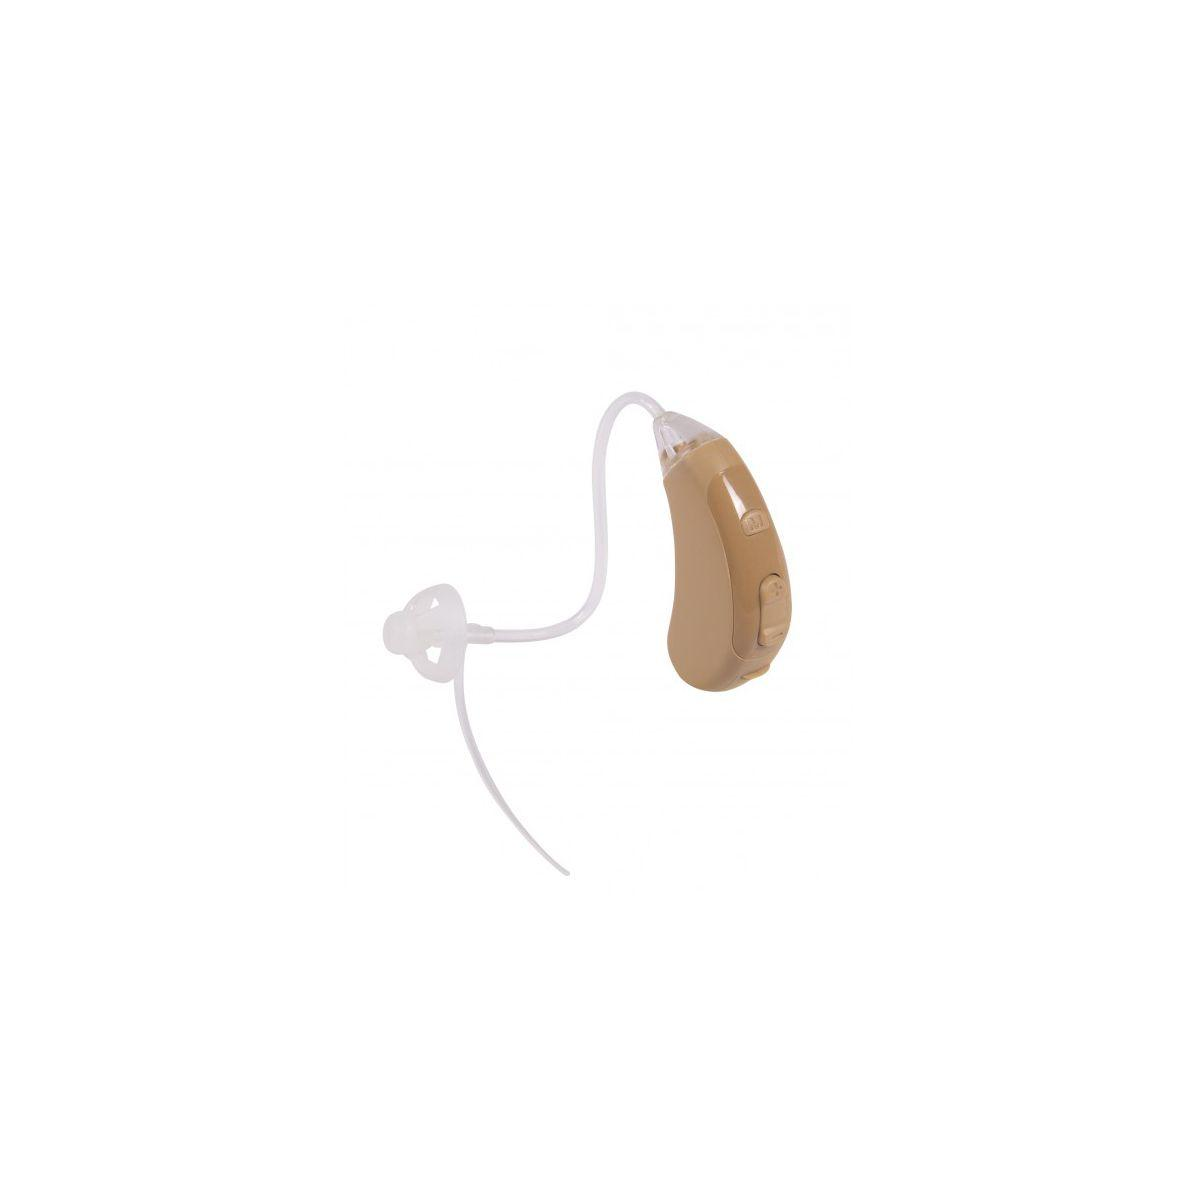 Appareil auditif lbs vhp902 - livraison offerte : code premium (photo)